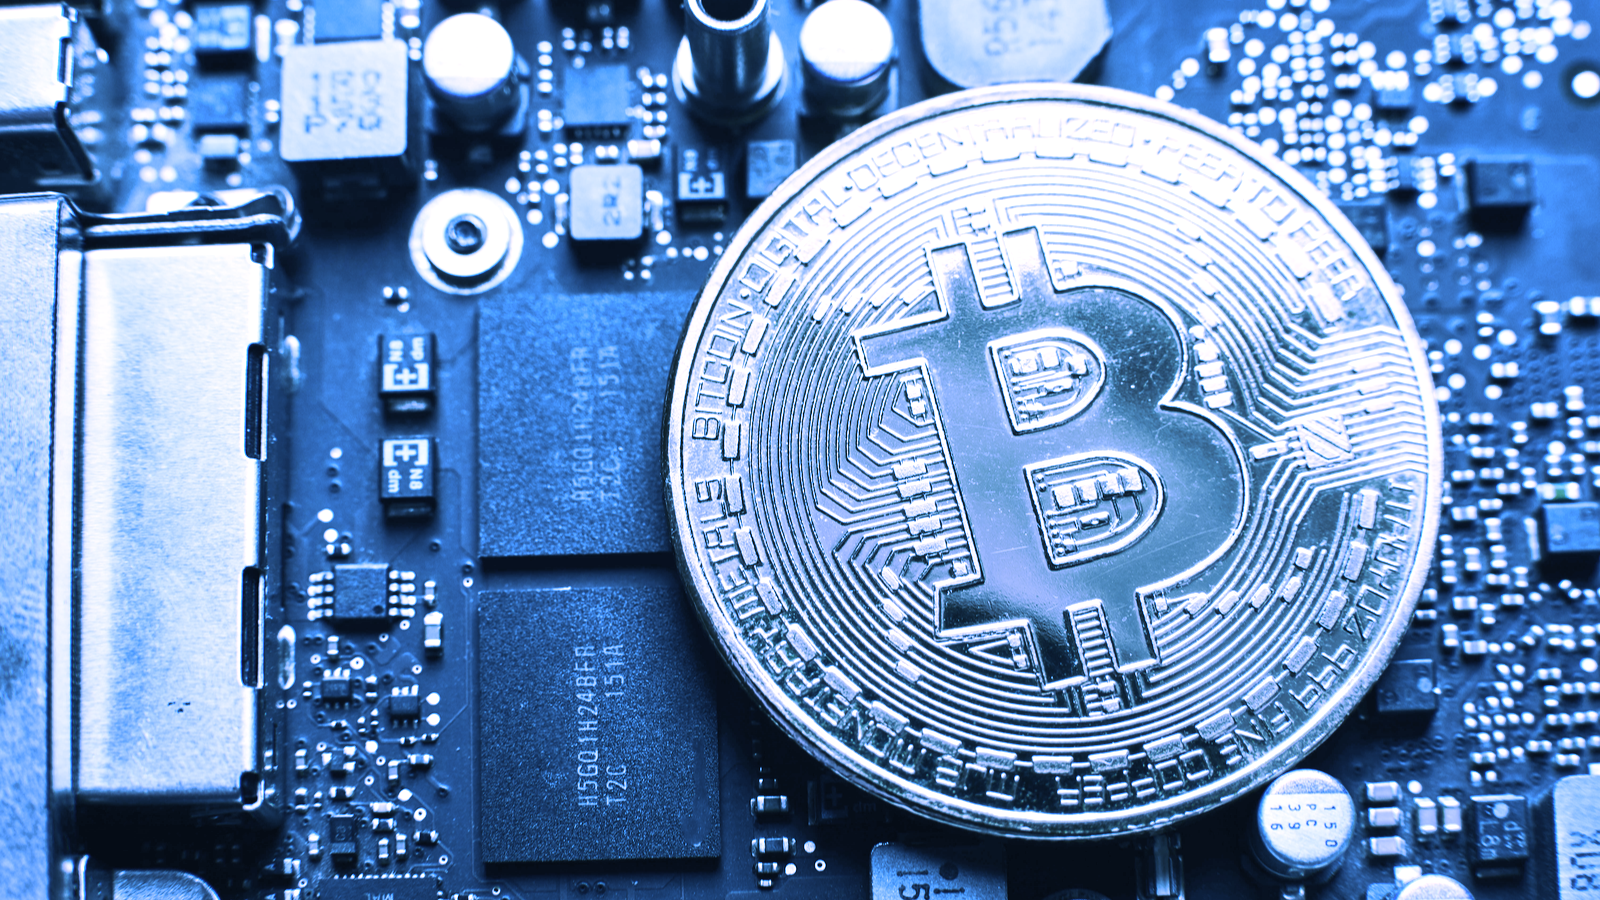 Bitcoin's High E-Waste Rate Worsens Environmental Concerns: Digiconomist